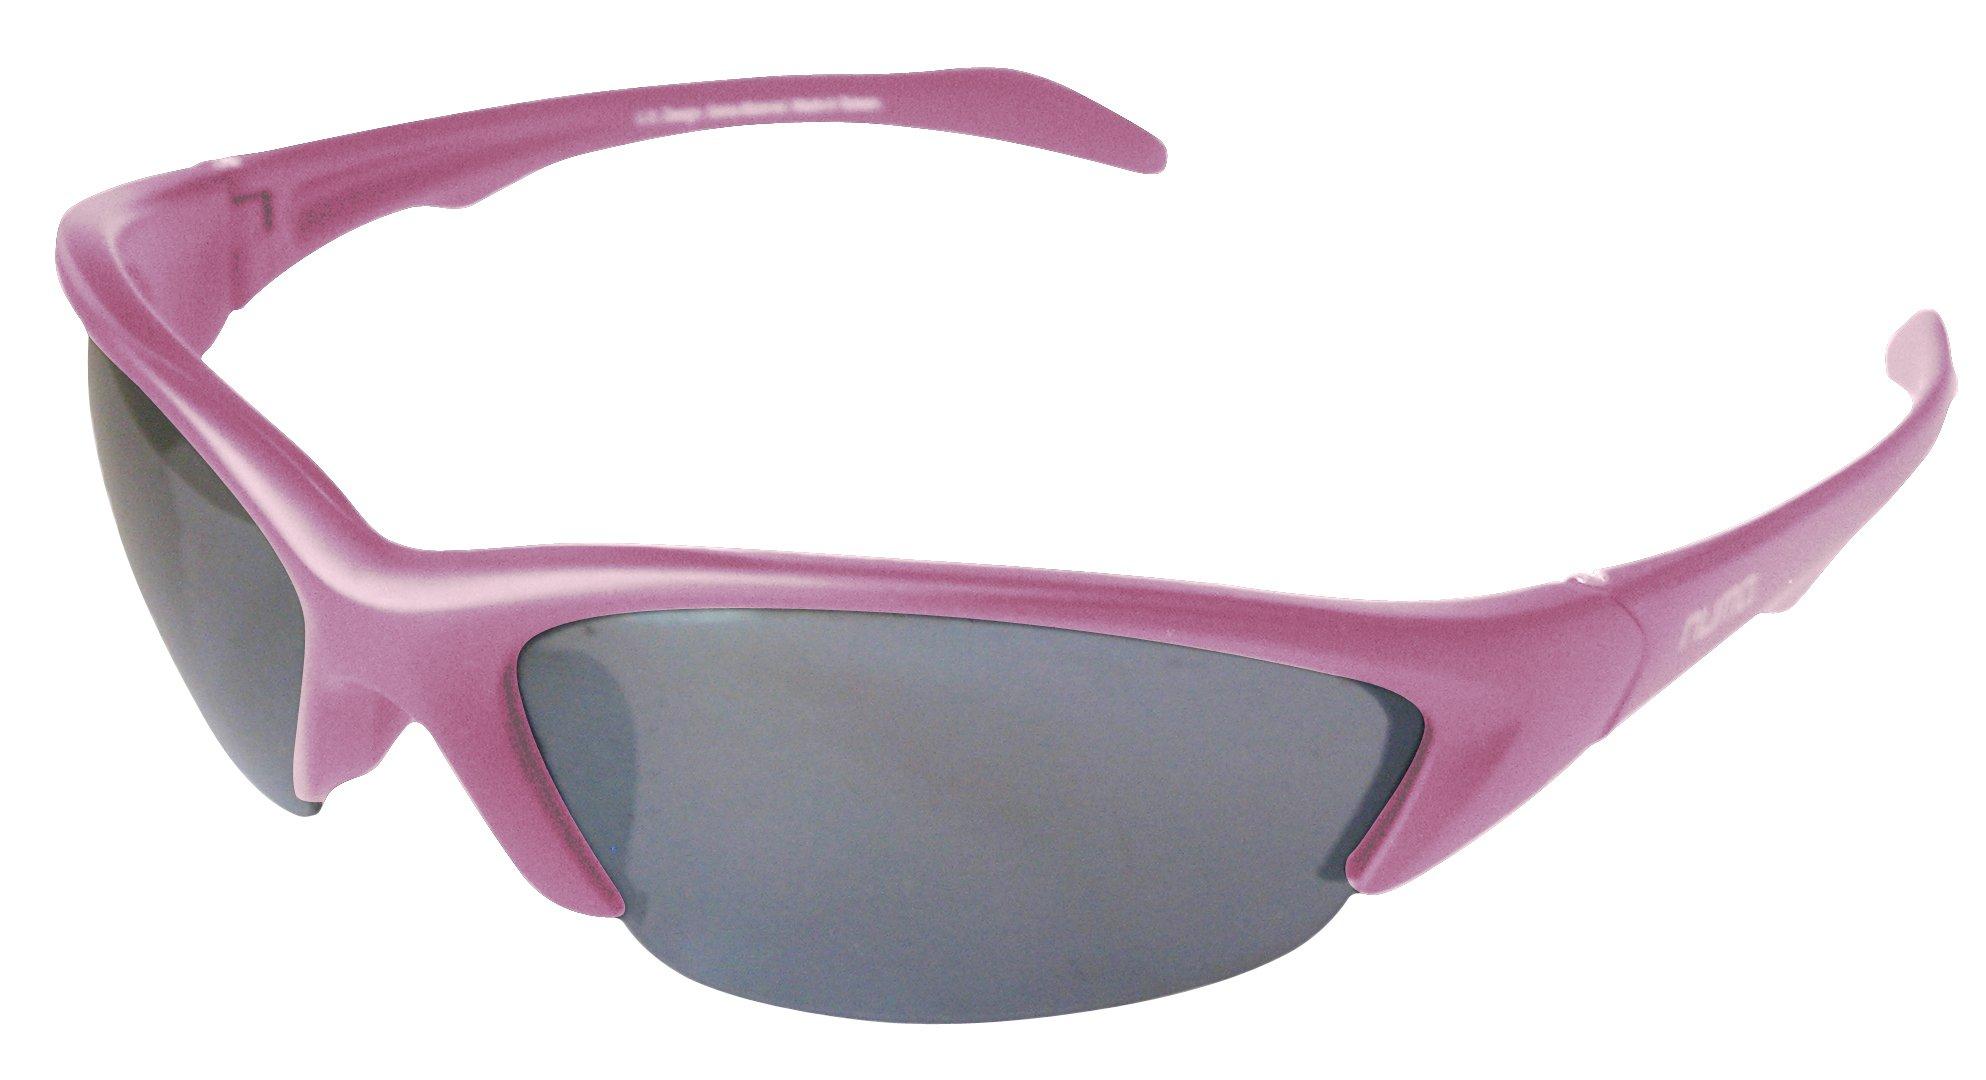 Numa Sport Optics 'Chisel Sport' Shooting Sunglasses - Pink Frames - 3 Lens Kit